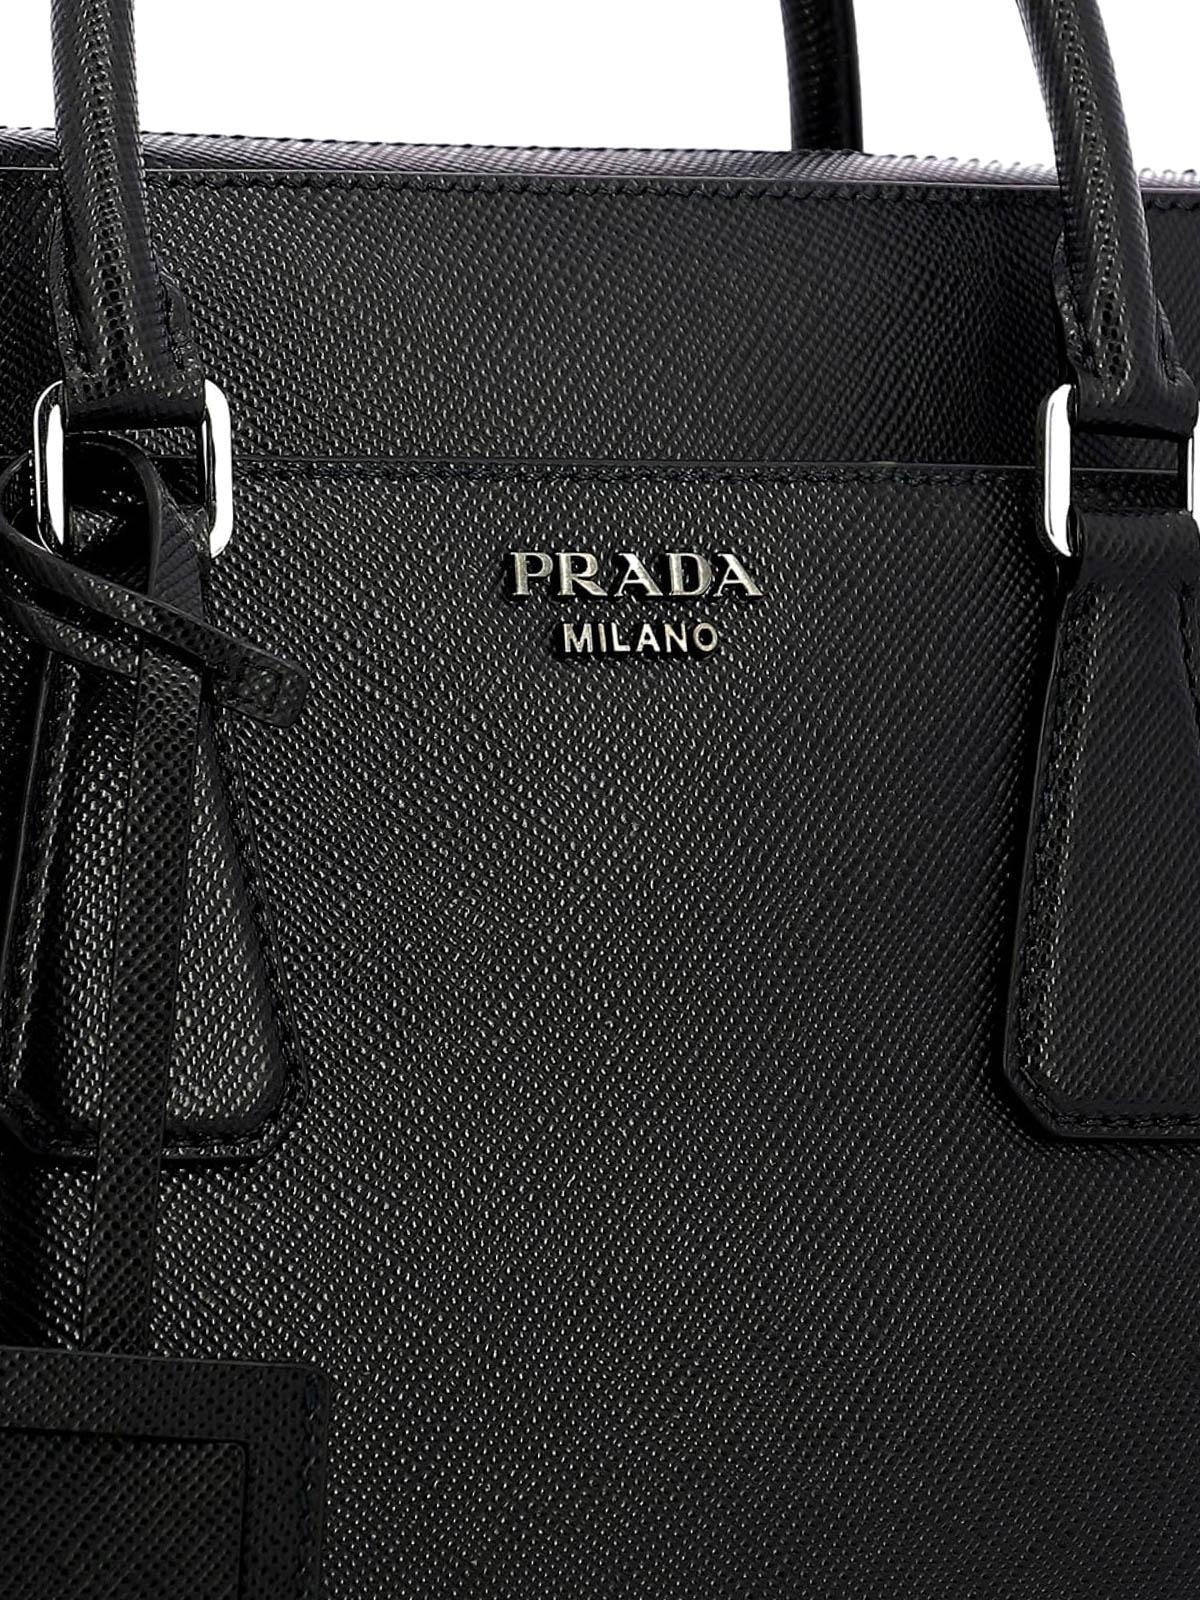 3ae5aa800421 Prada - Black saffiano leather briefcase - laptop bags   briefcases ...